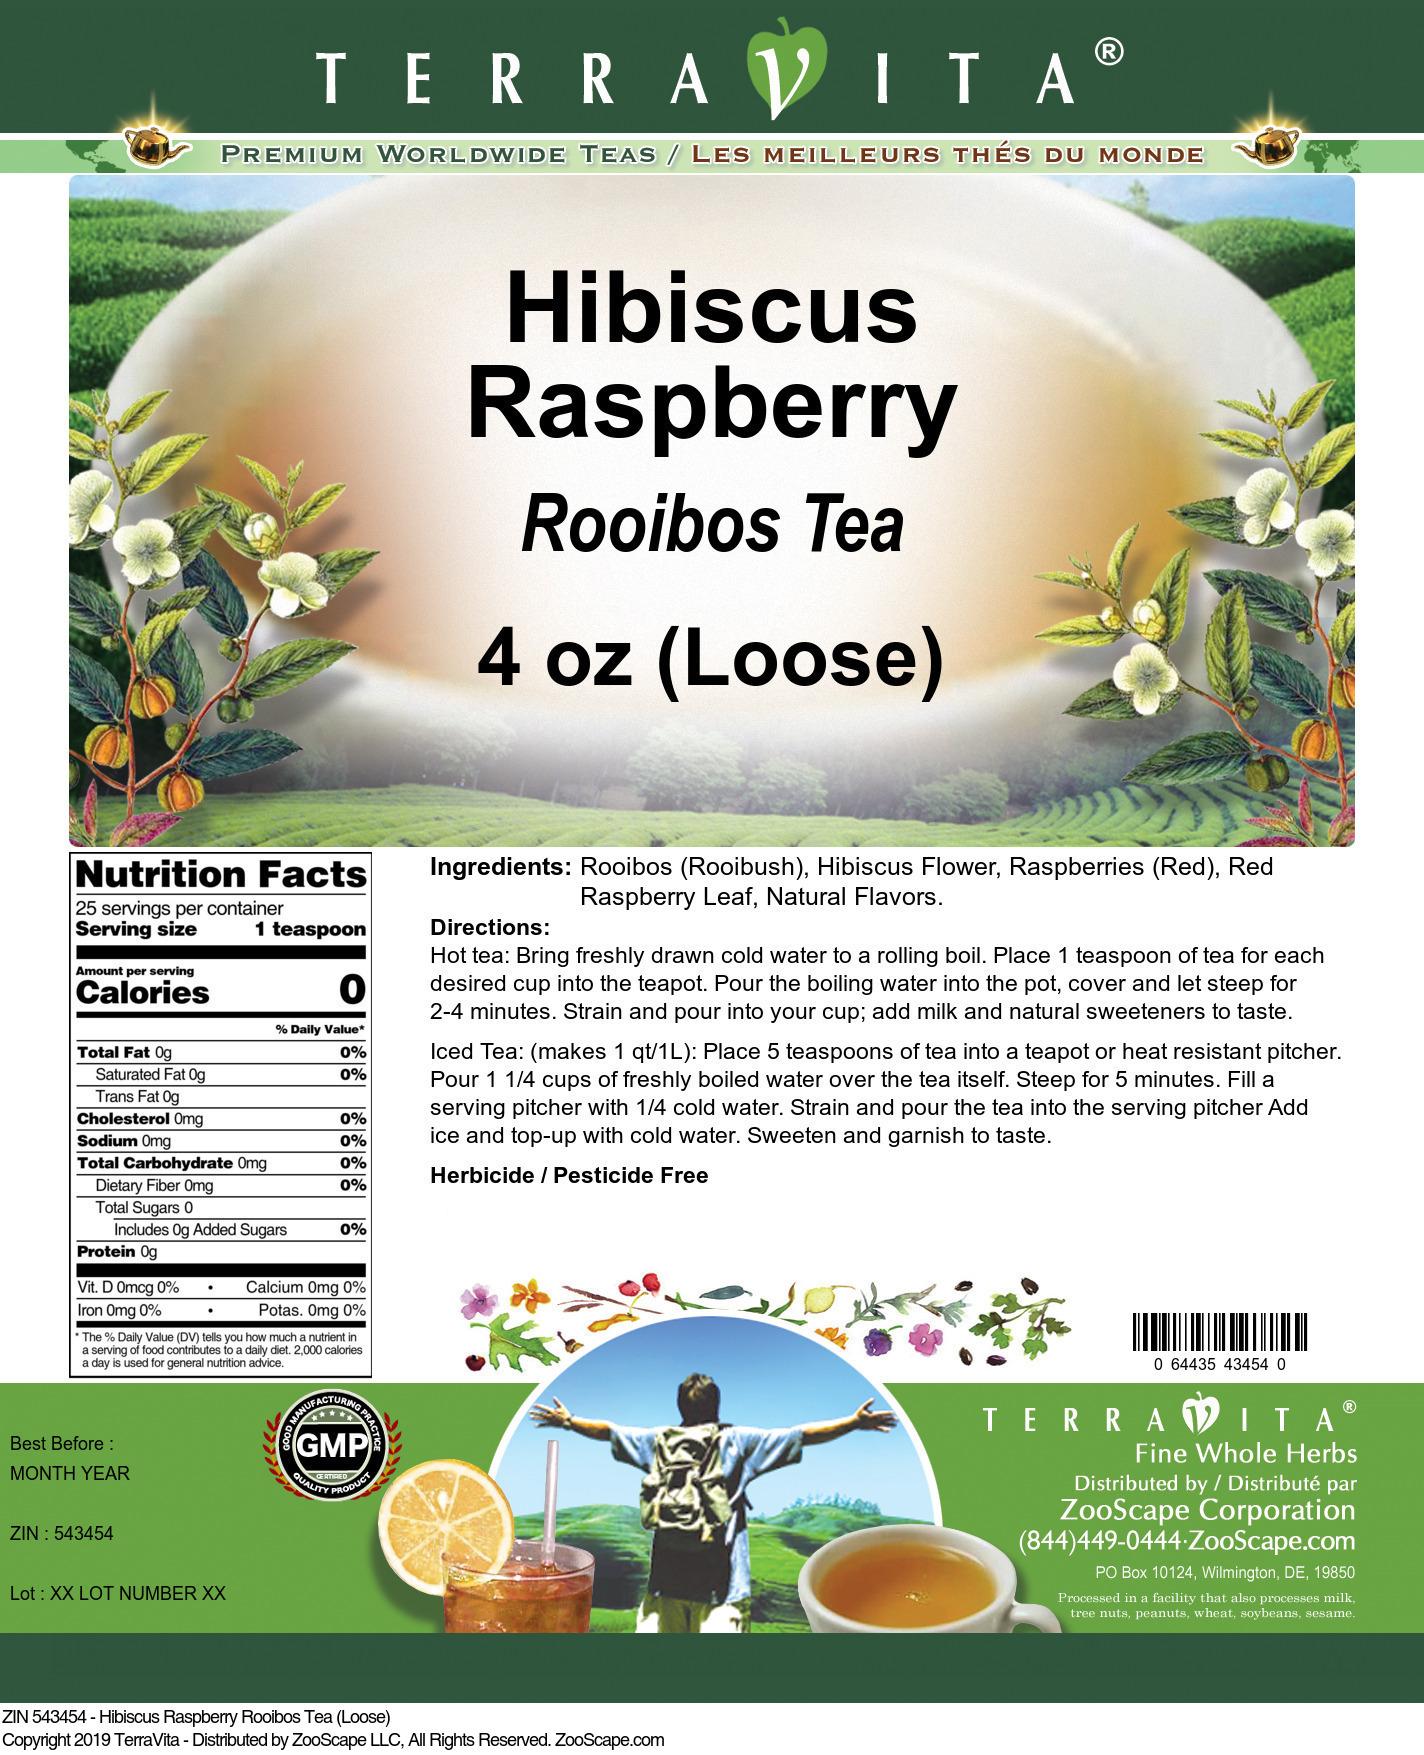 Hibiscus Raspberry Rooibos Tea (Loose)